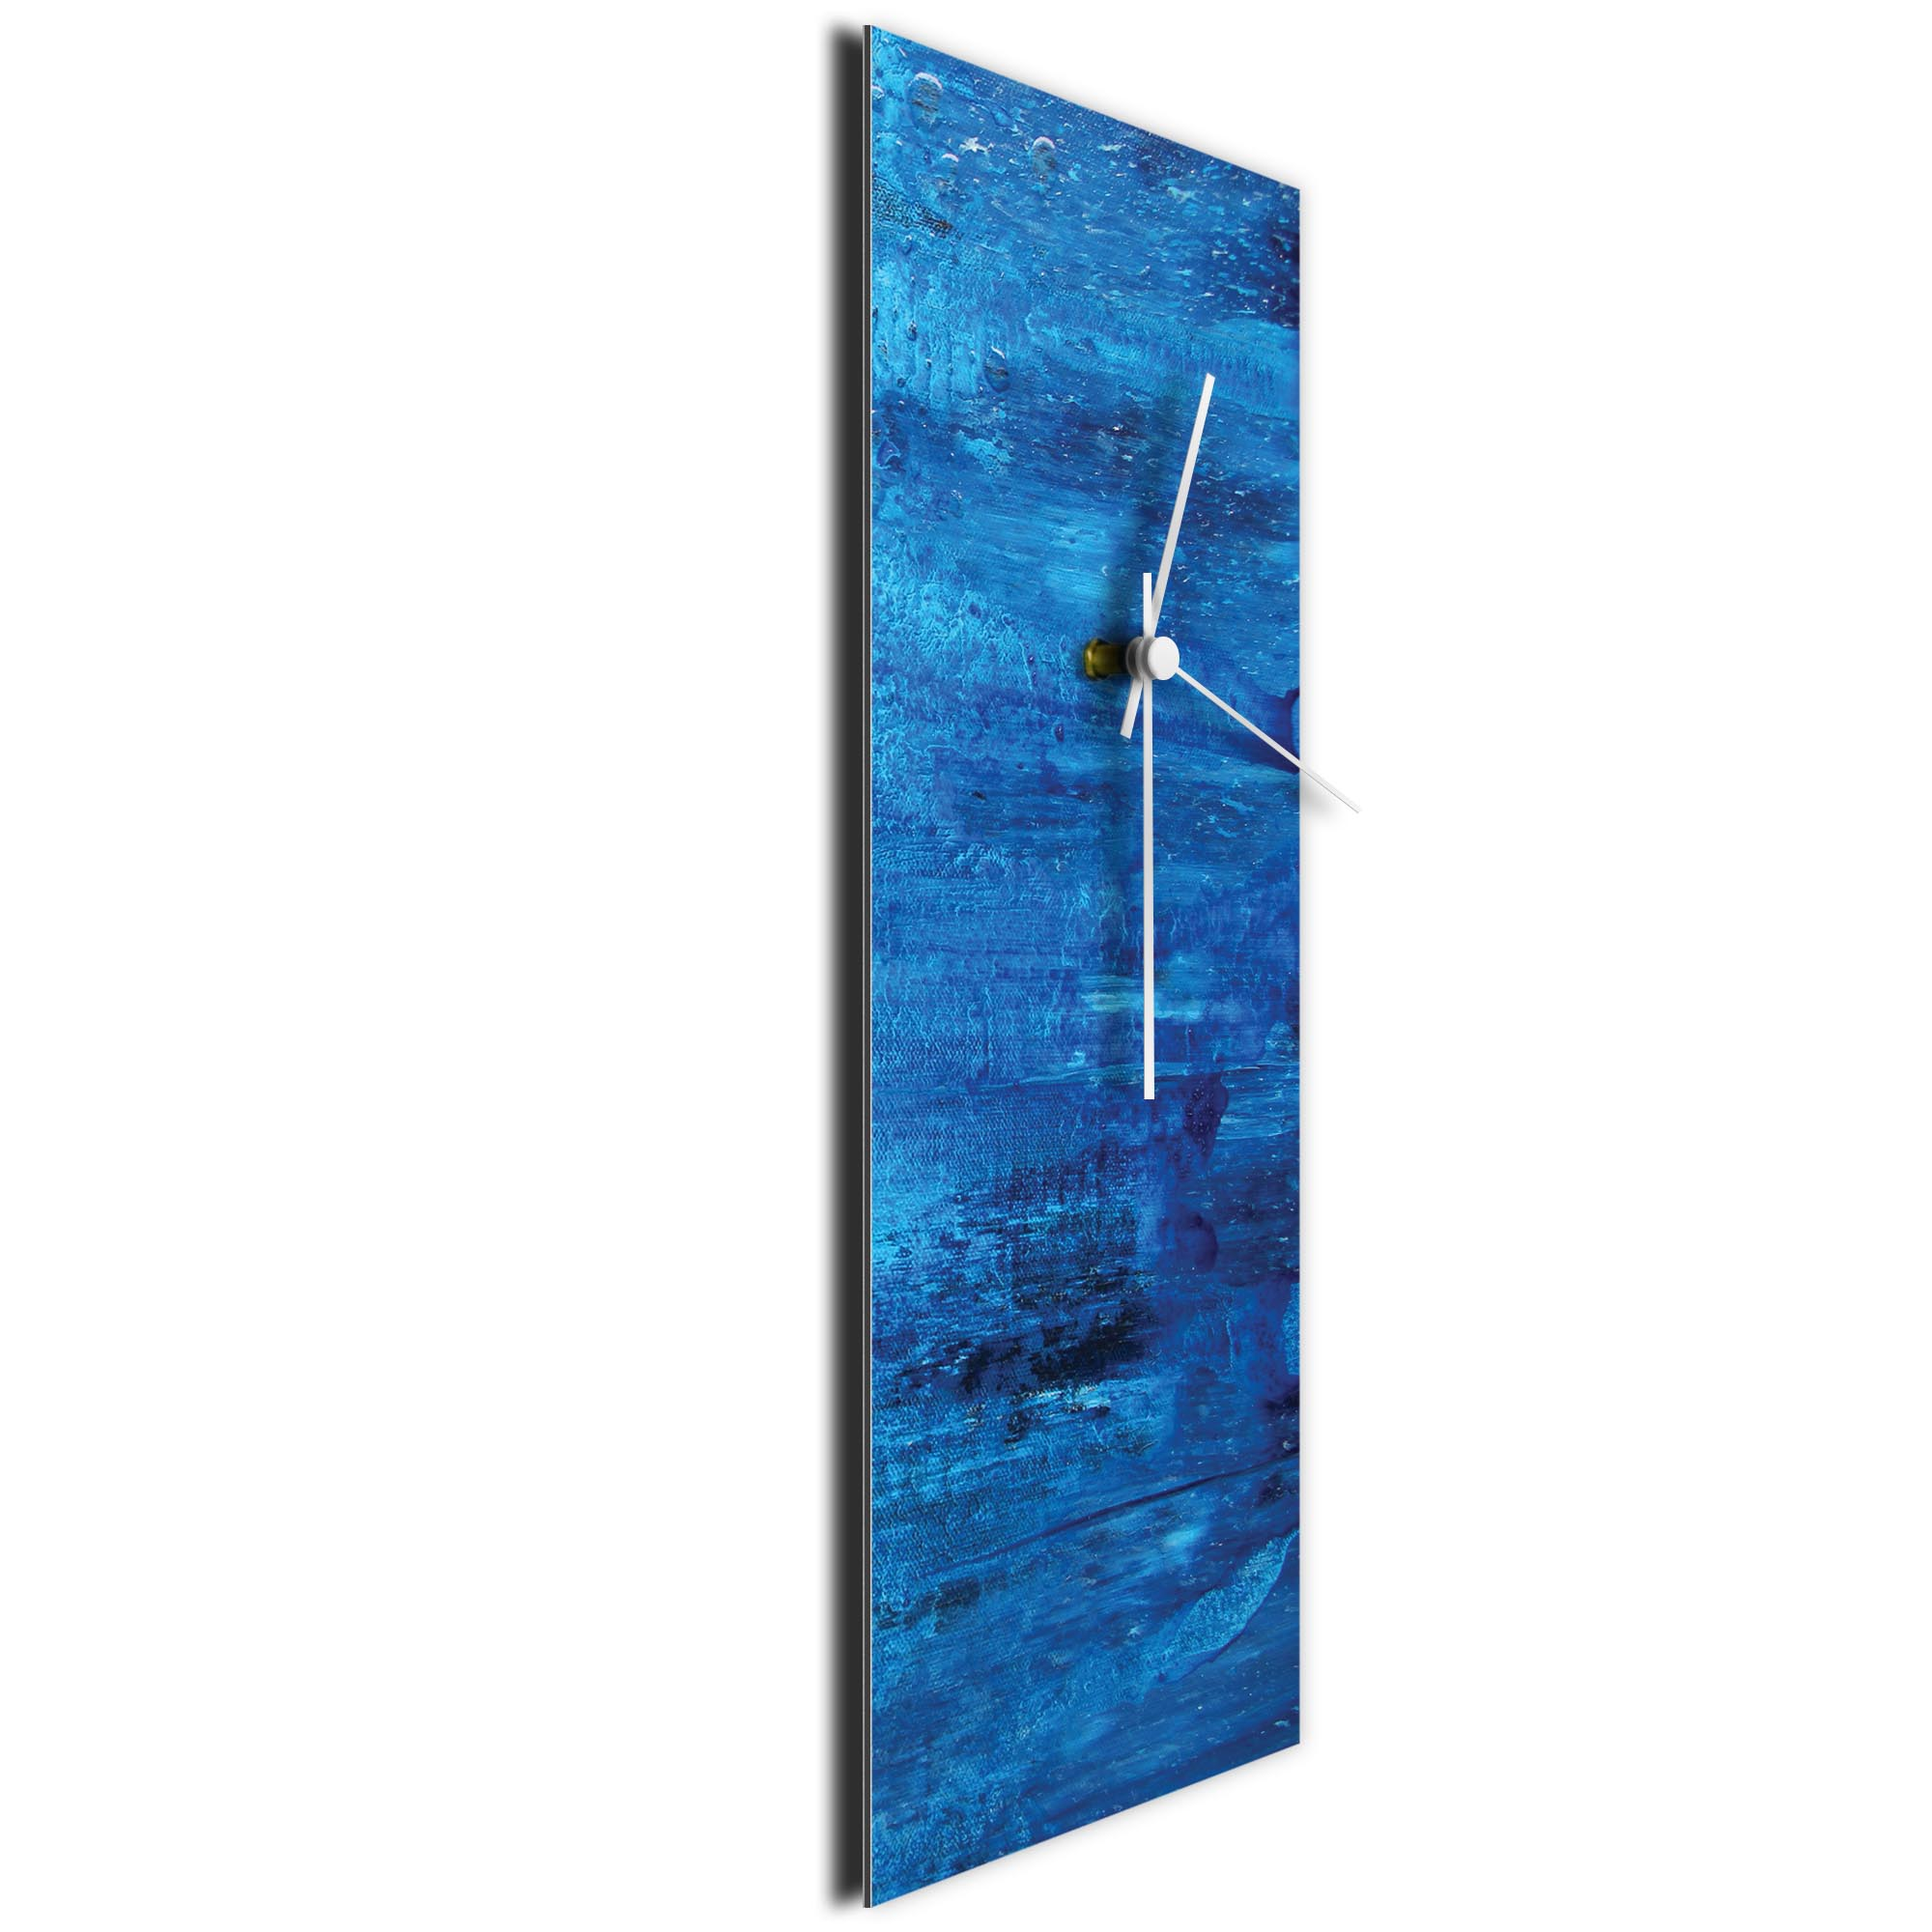 City Blue v2 Clock by Mendo Vasilevski - Urban Abstract Home Decor - Image 3